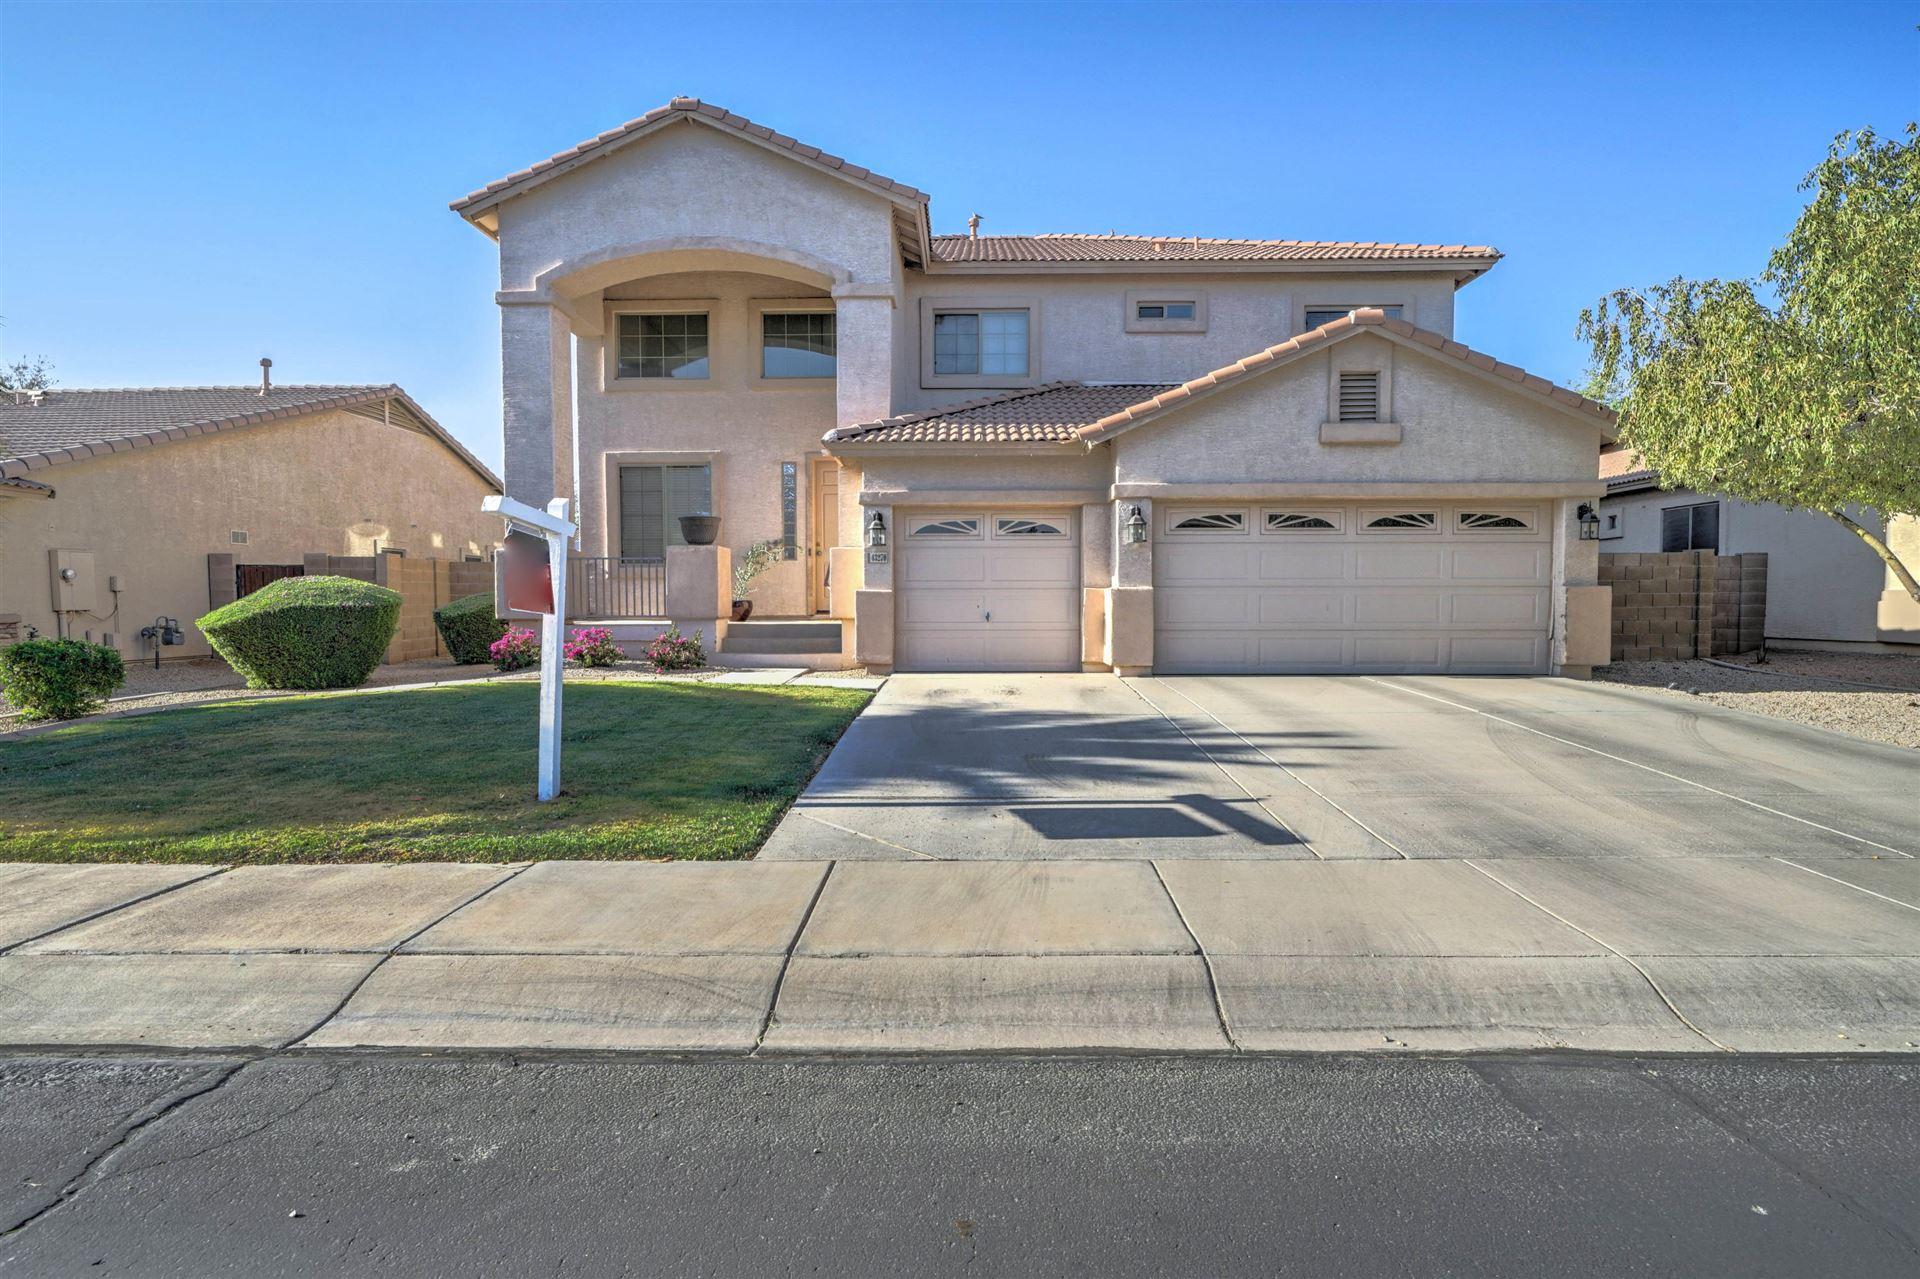 Photo for 43270 W CYDNEE Drive, Maricopa, AZ 85138 (MLS # 6225838)